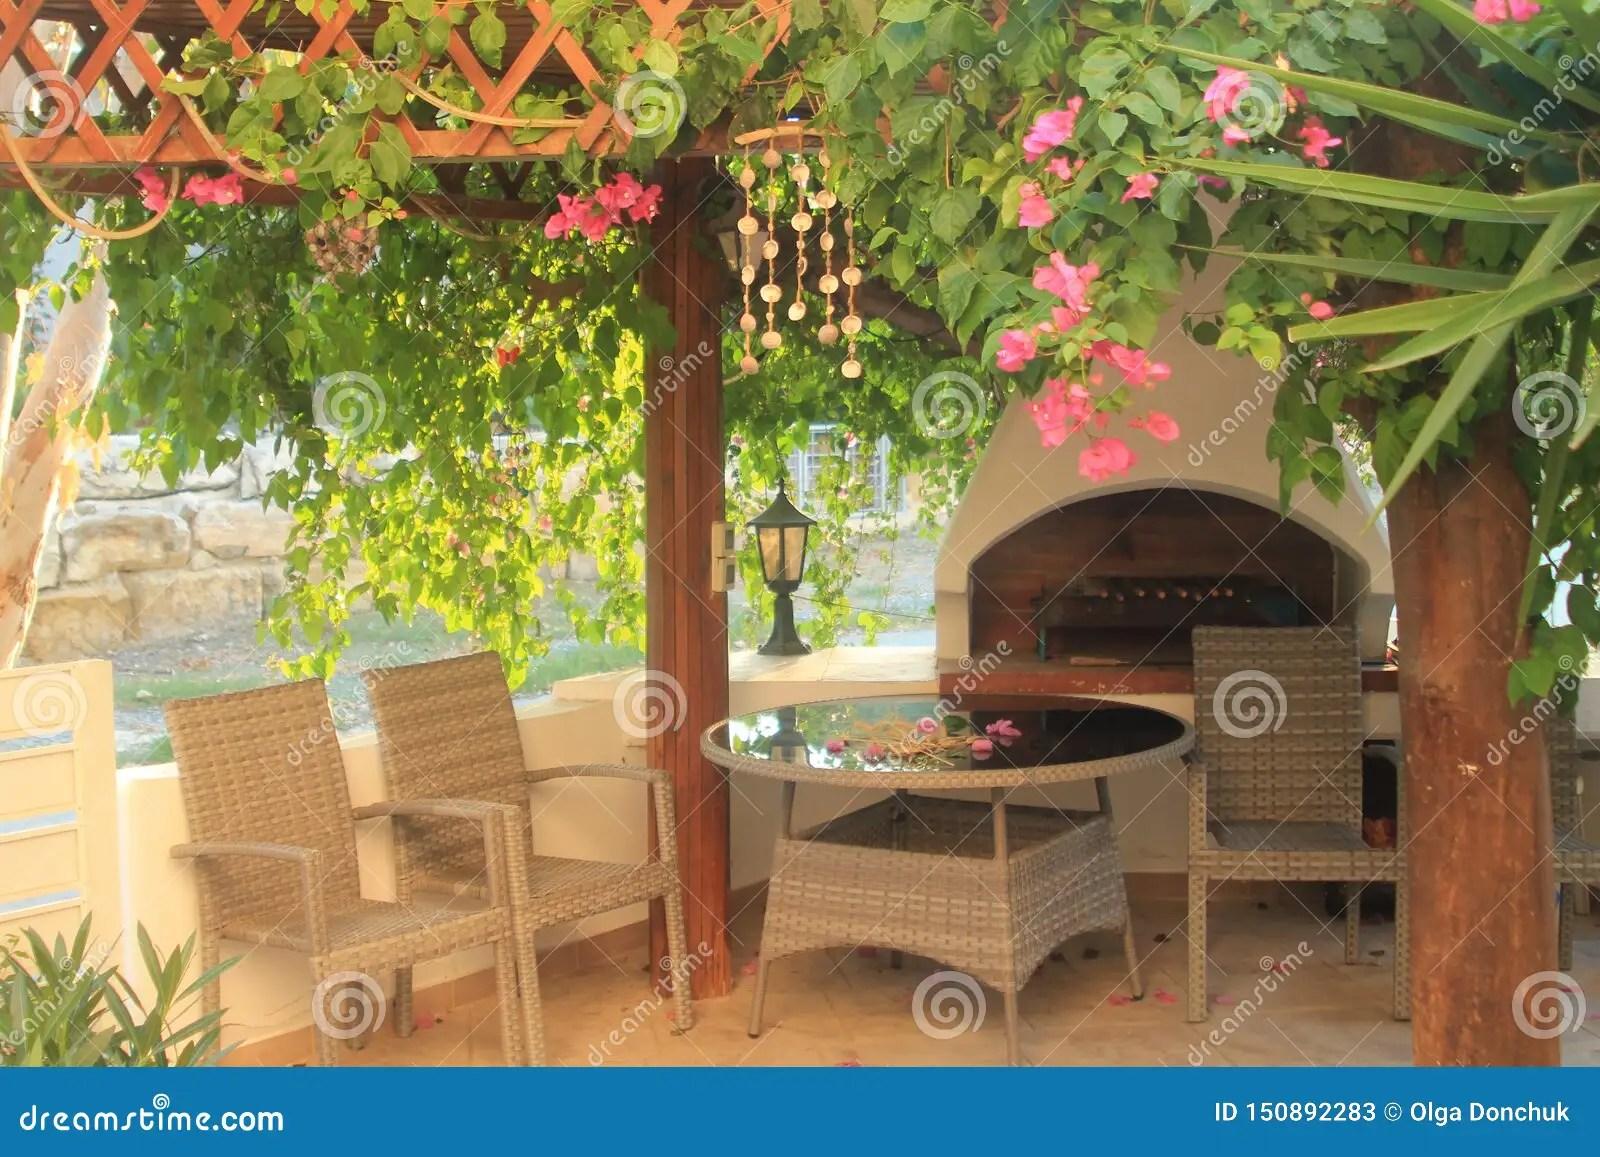 https www dreamstime com barbeque gazebo garden barbeque gazebo grill patio furniture set green leaves pink flowers image150892283